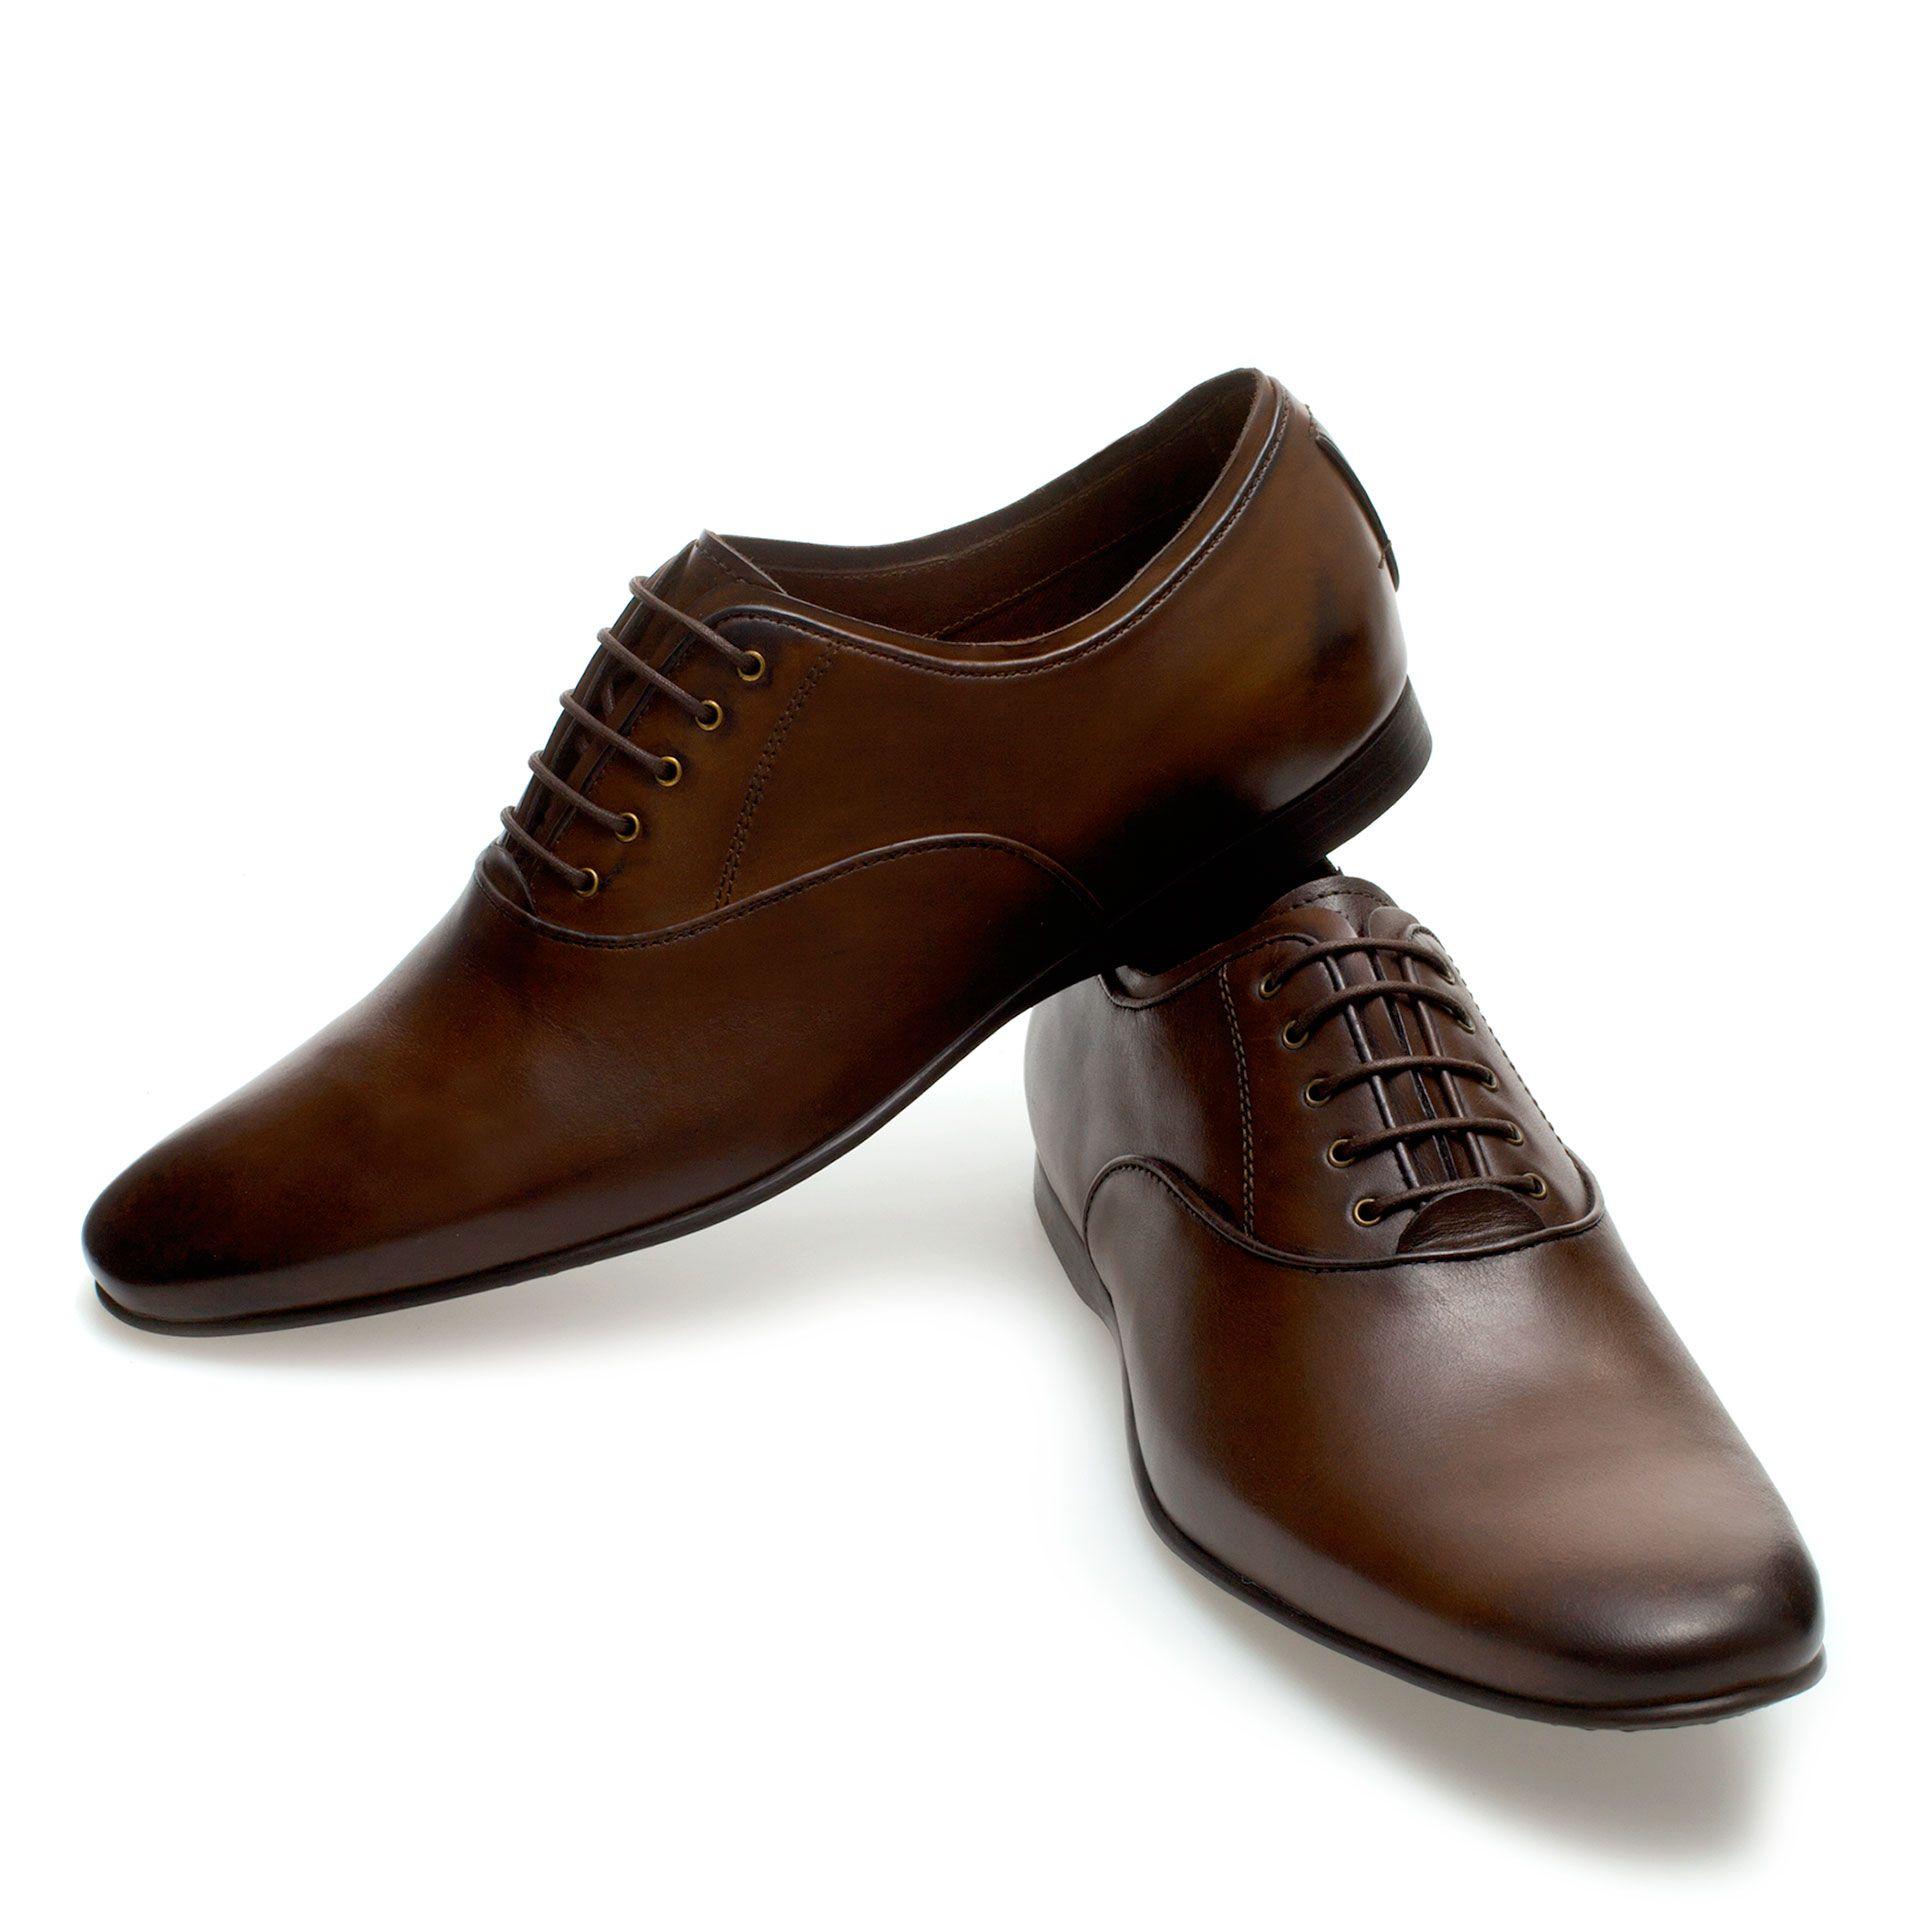 Zara Clothes Hombre Vestir Shoes Zapatos Slim Salvador El E6Ytxdqd4w